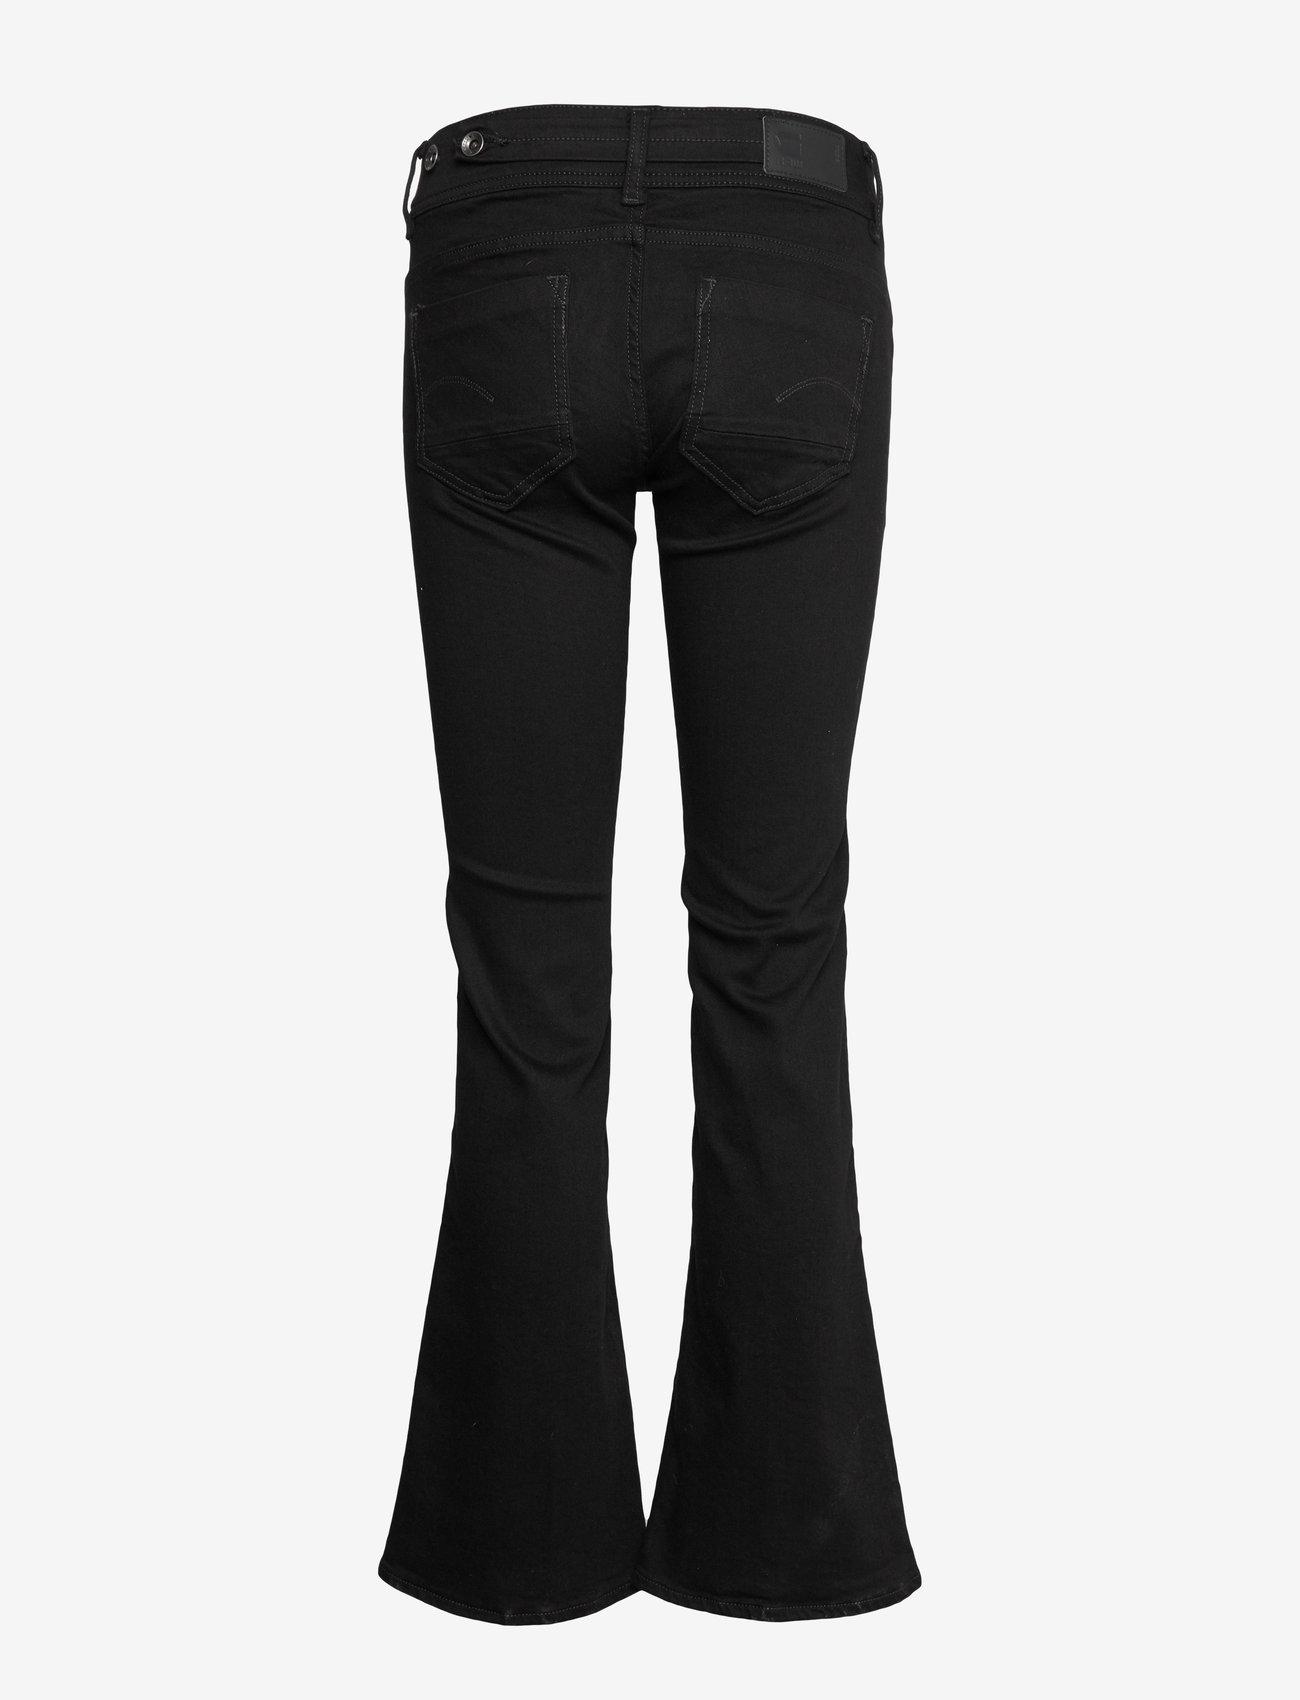 G-star RAW - Midge Mid Bootcut Wmn - bootcut jeans - pitch black - 1